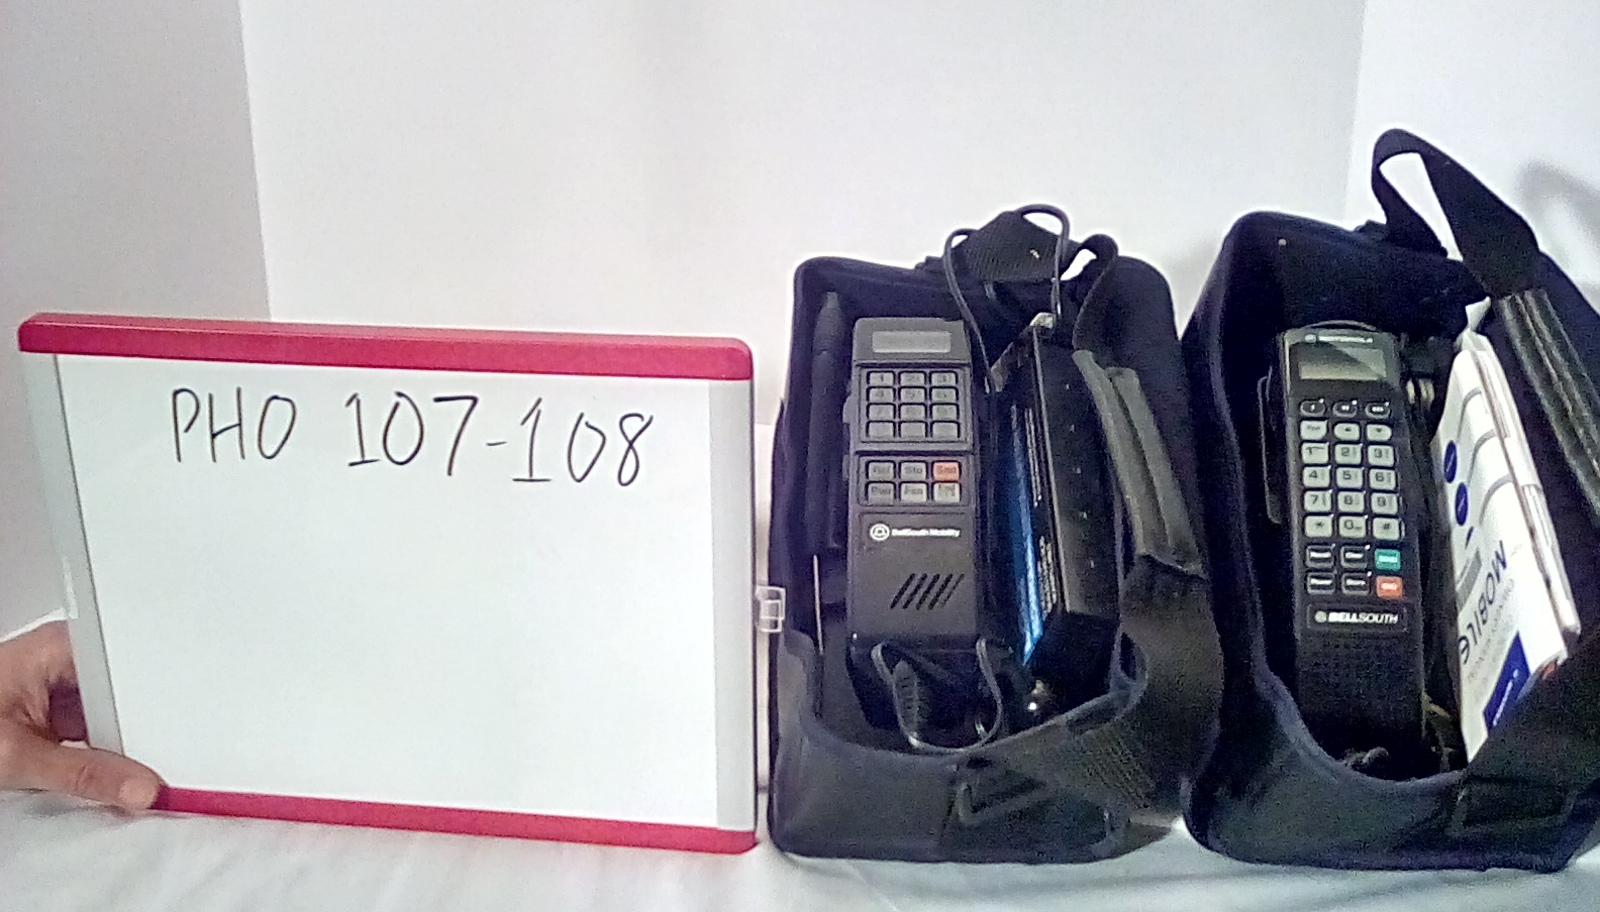 PHO107 Bell south motorola bag phone, PHO108 Bell south motorola bag phone w/green buttons